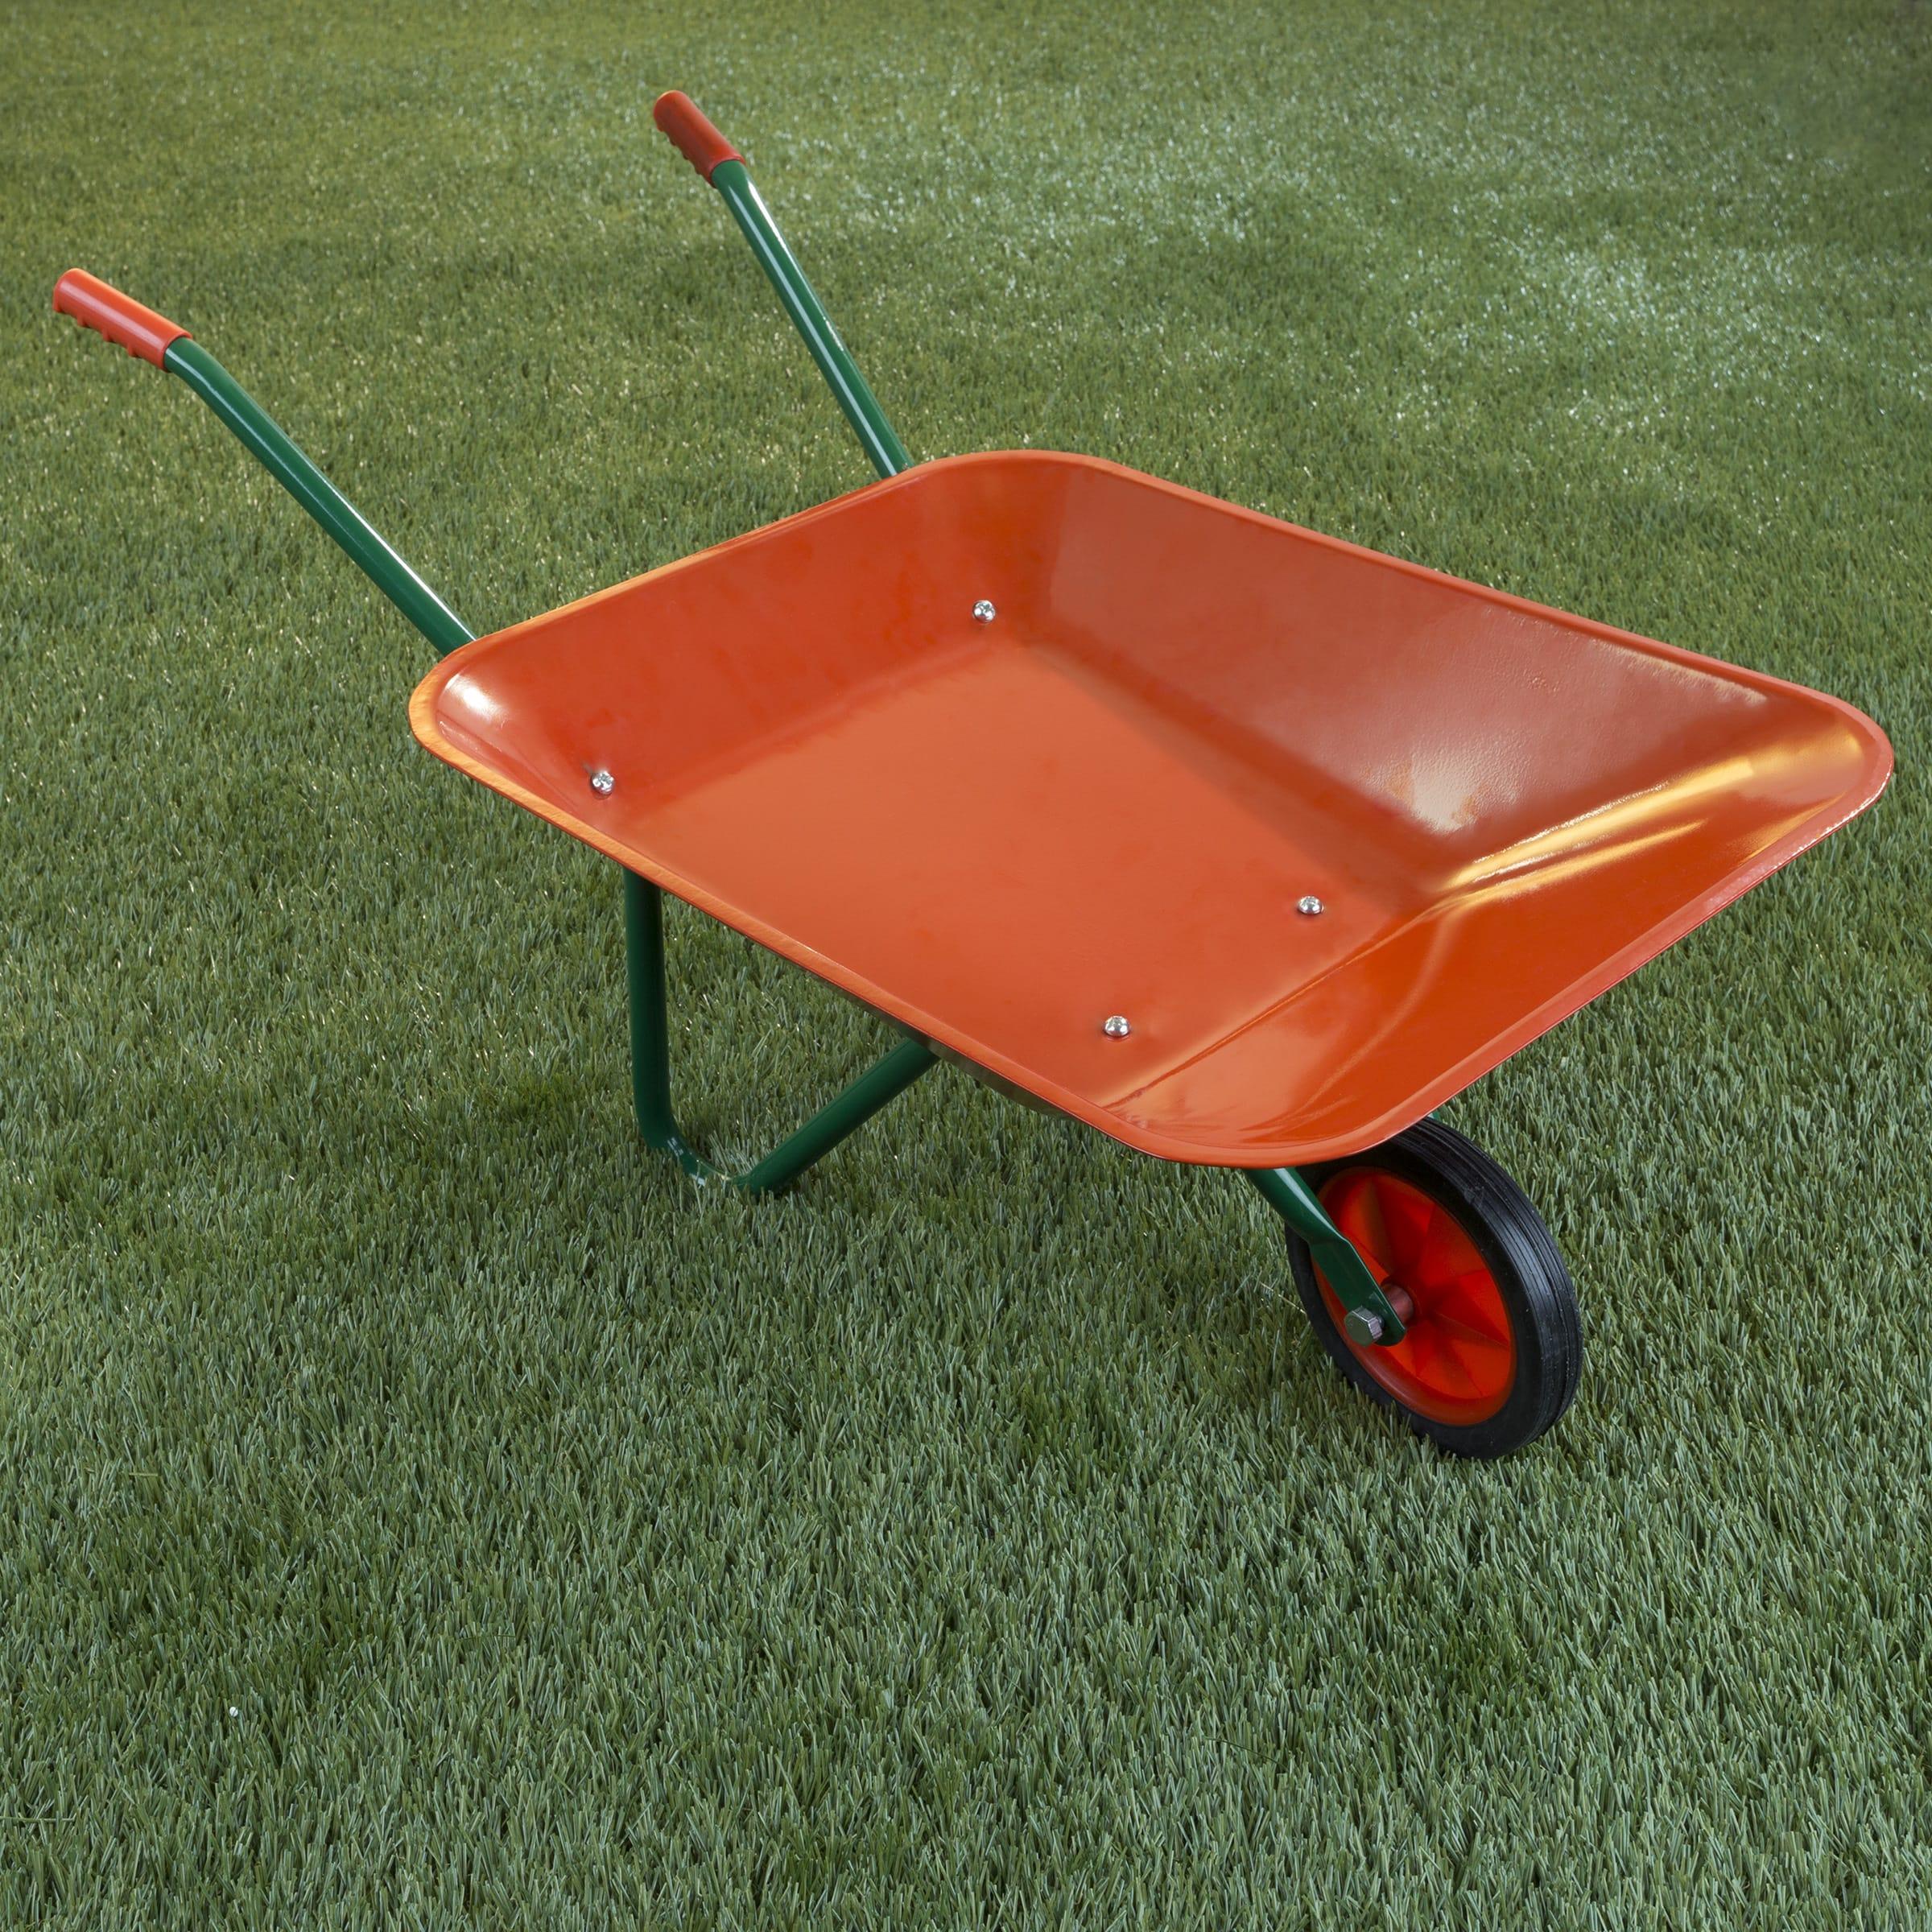 Shop Kidsu0027 Gardening Wheelbarrow   Free Shipping On Orders Over $45    Overstock.com   20378271